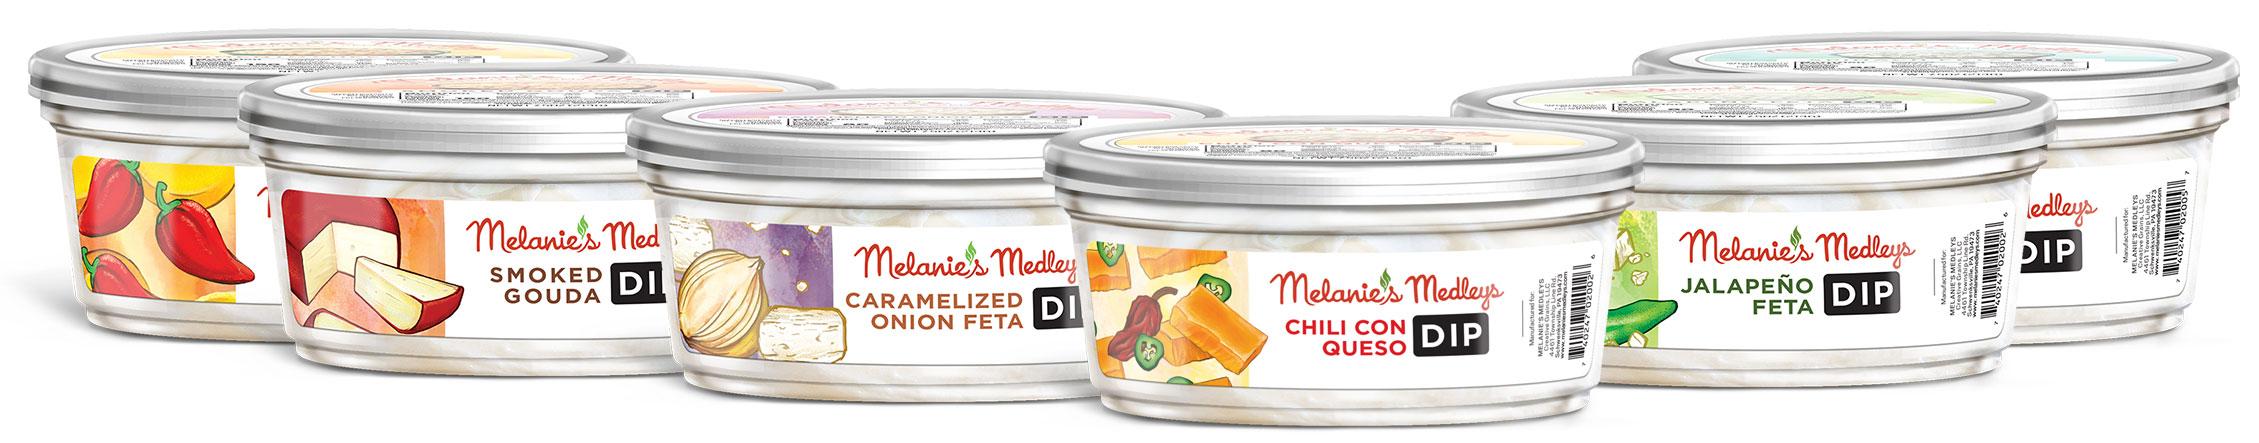 Melanie's Medley Dips